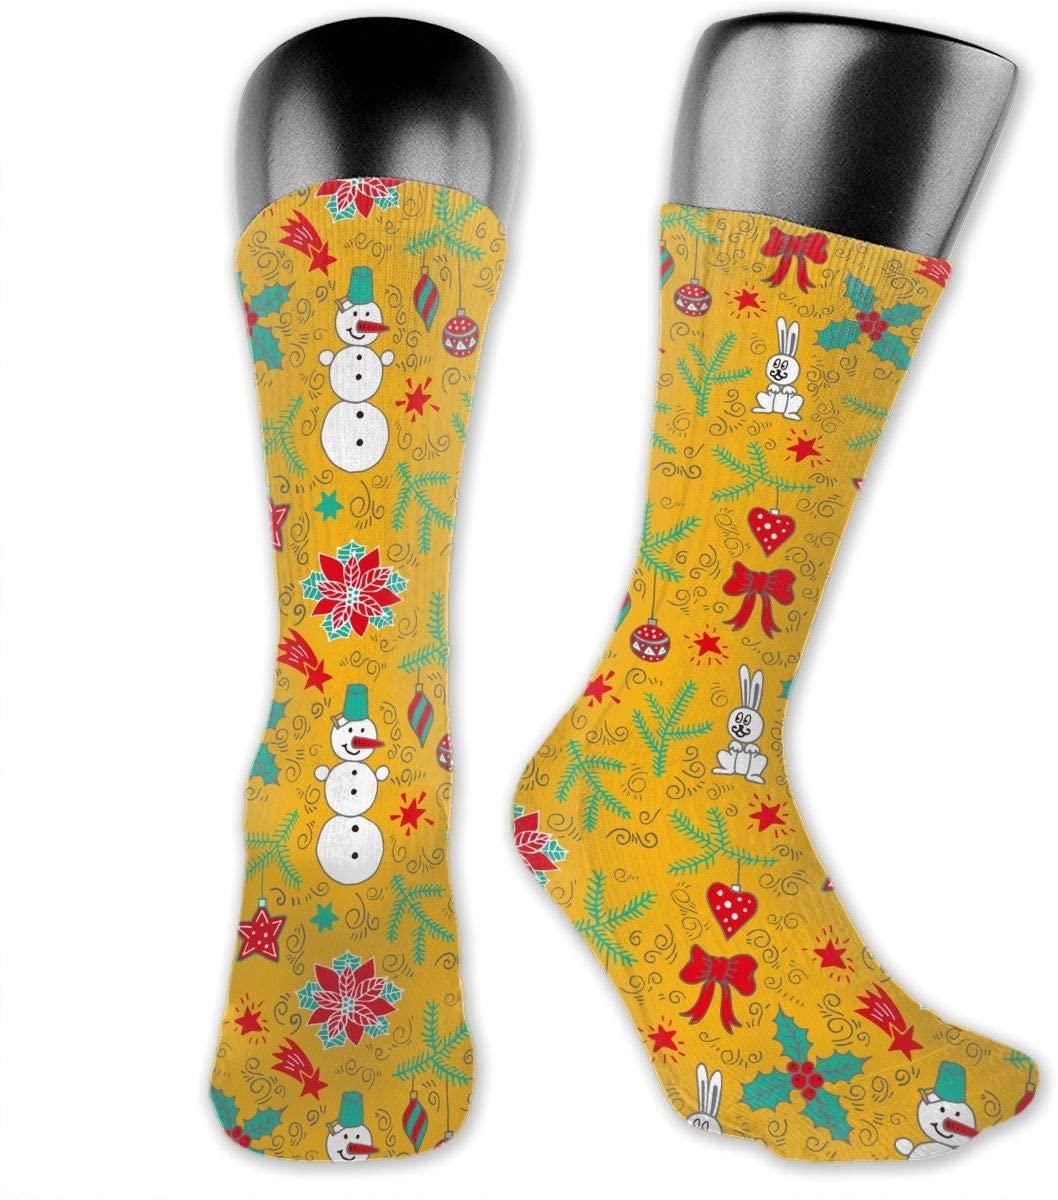 Christmas Snowman Unisex Outdoor Long Socks Sport Athletic Crew Socks Stockings